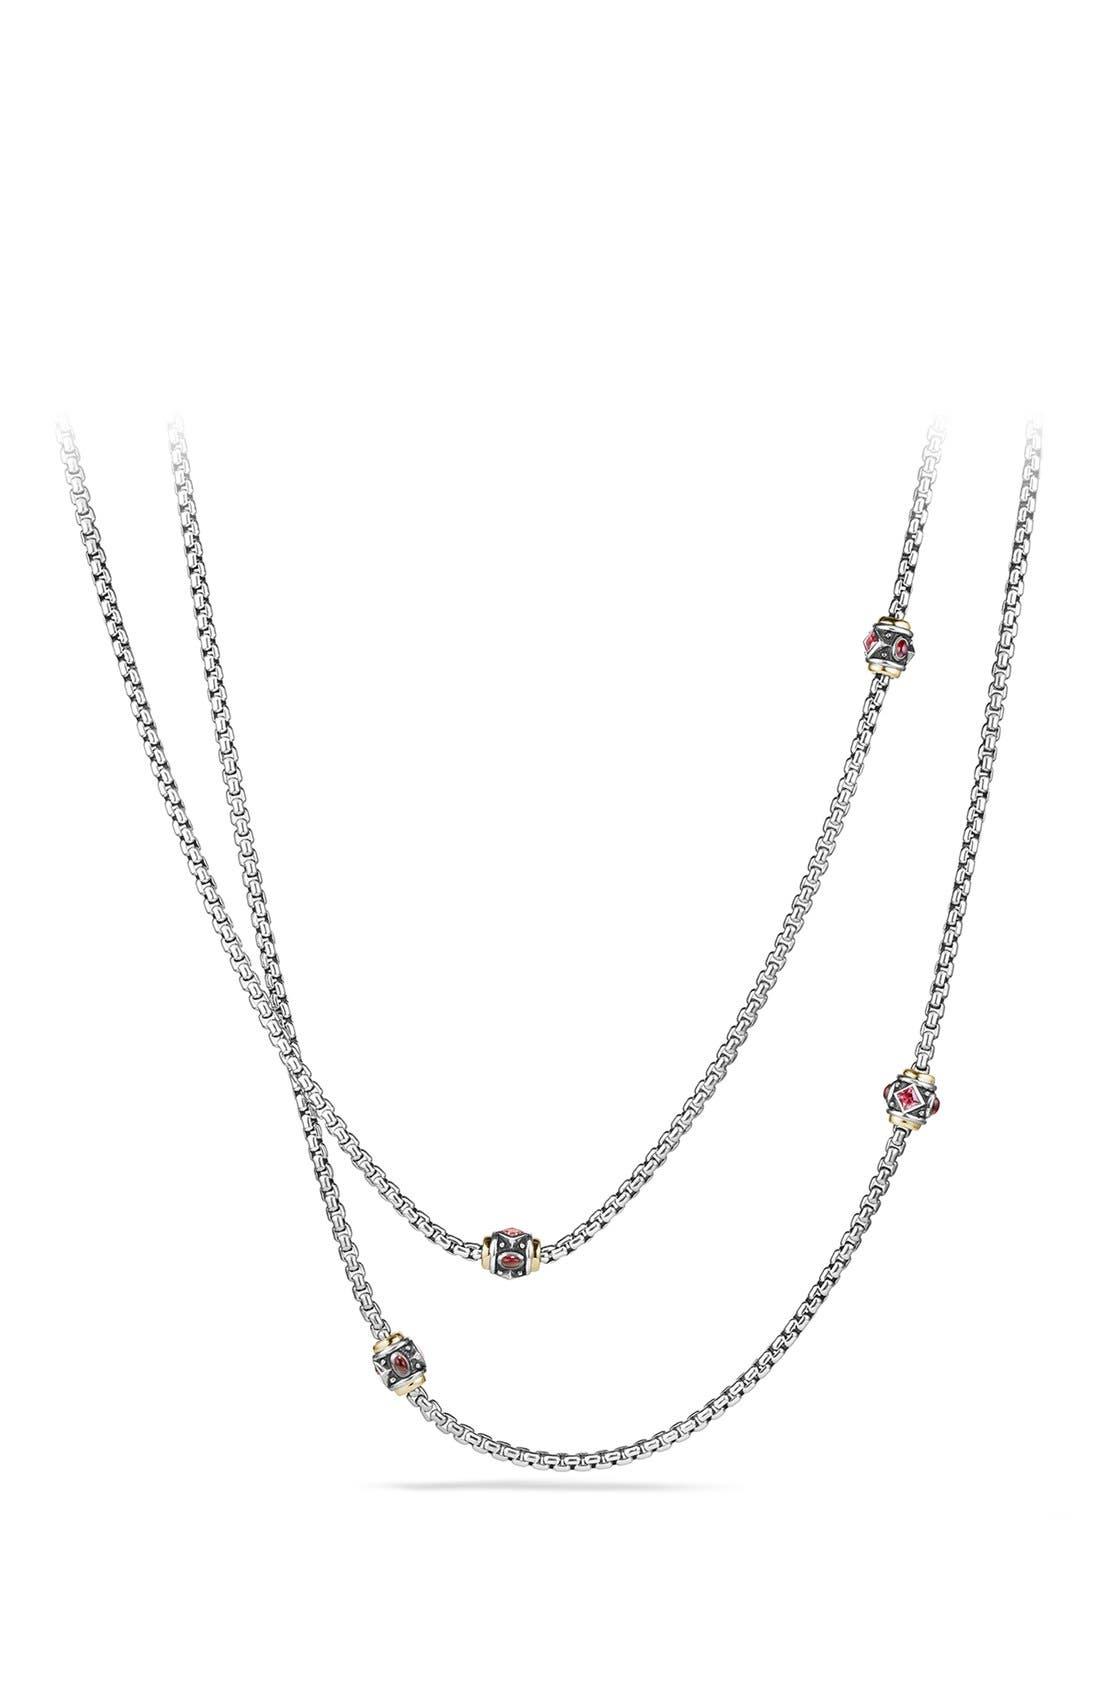 David Yurman 'Renaissance' Necklace with Semiprecious Stone and 18k Gold